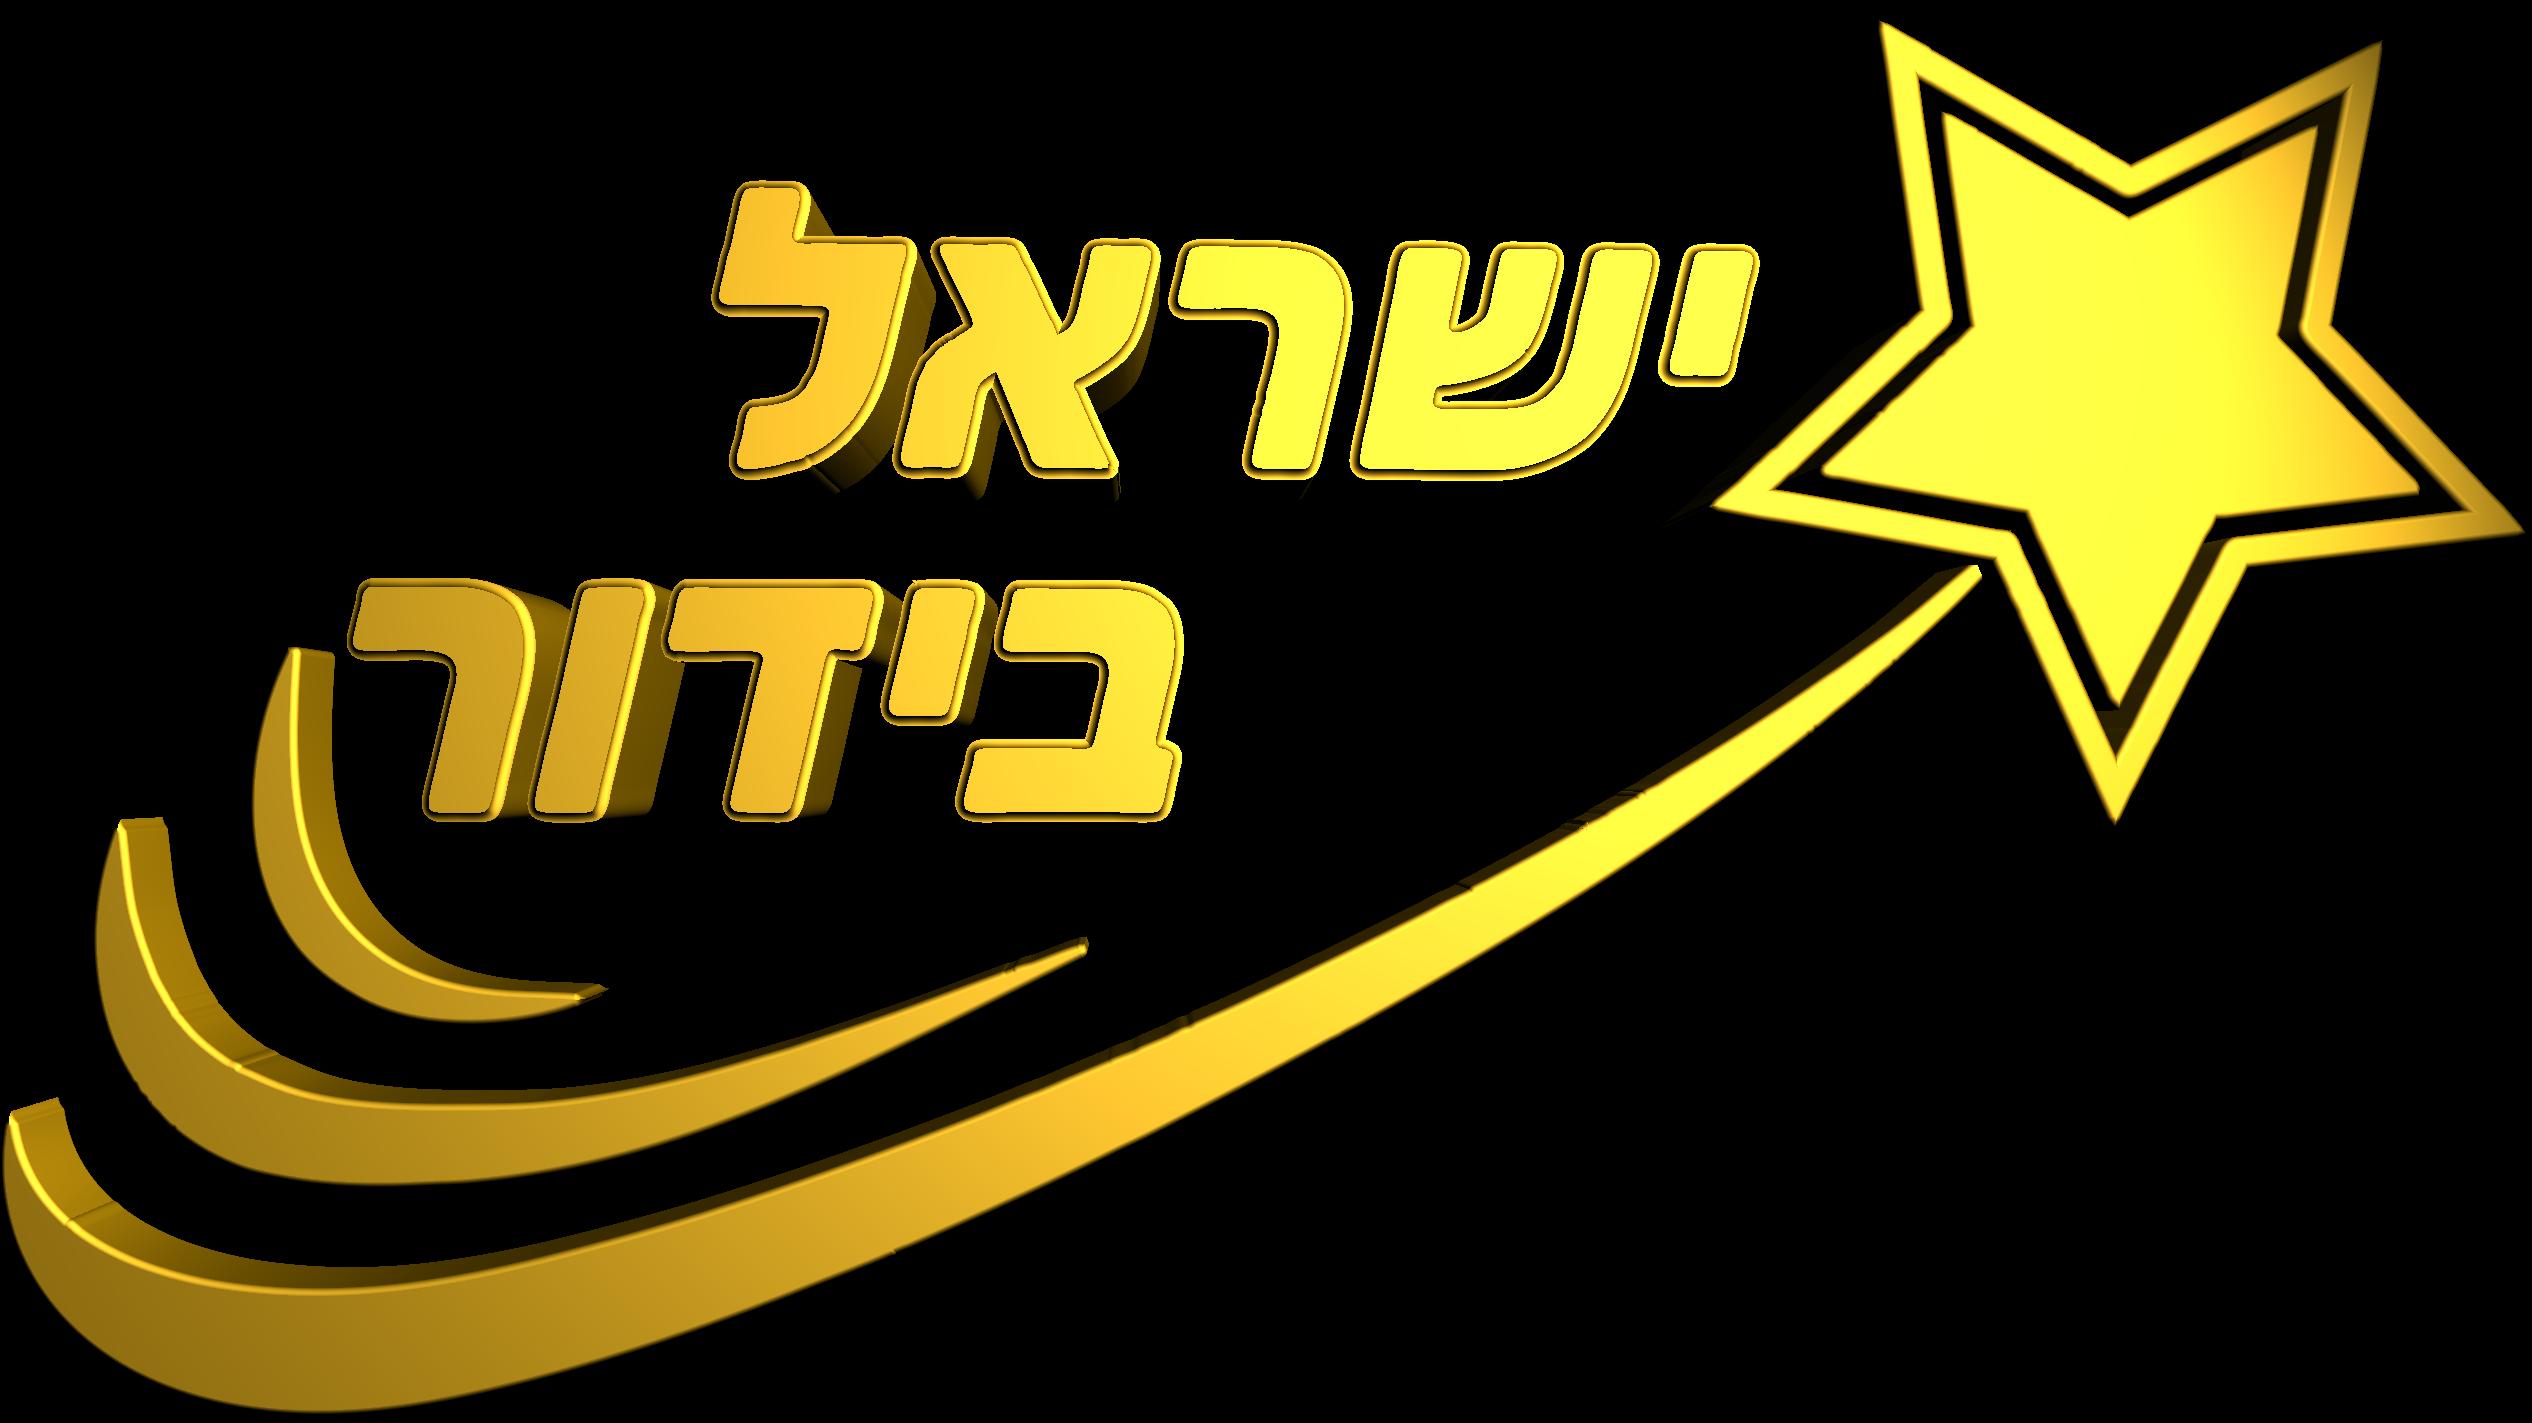 Israel Bidur